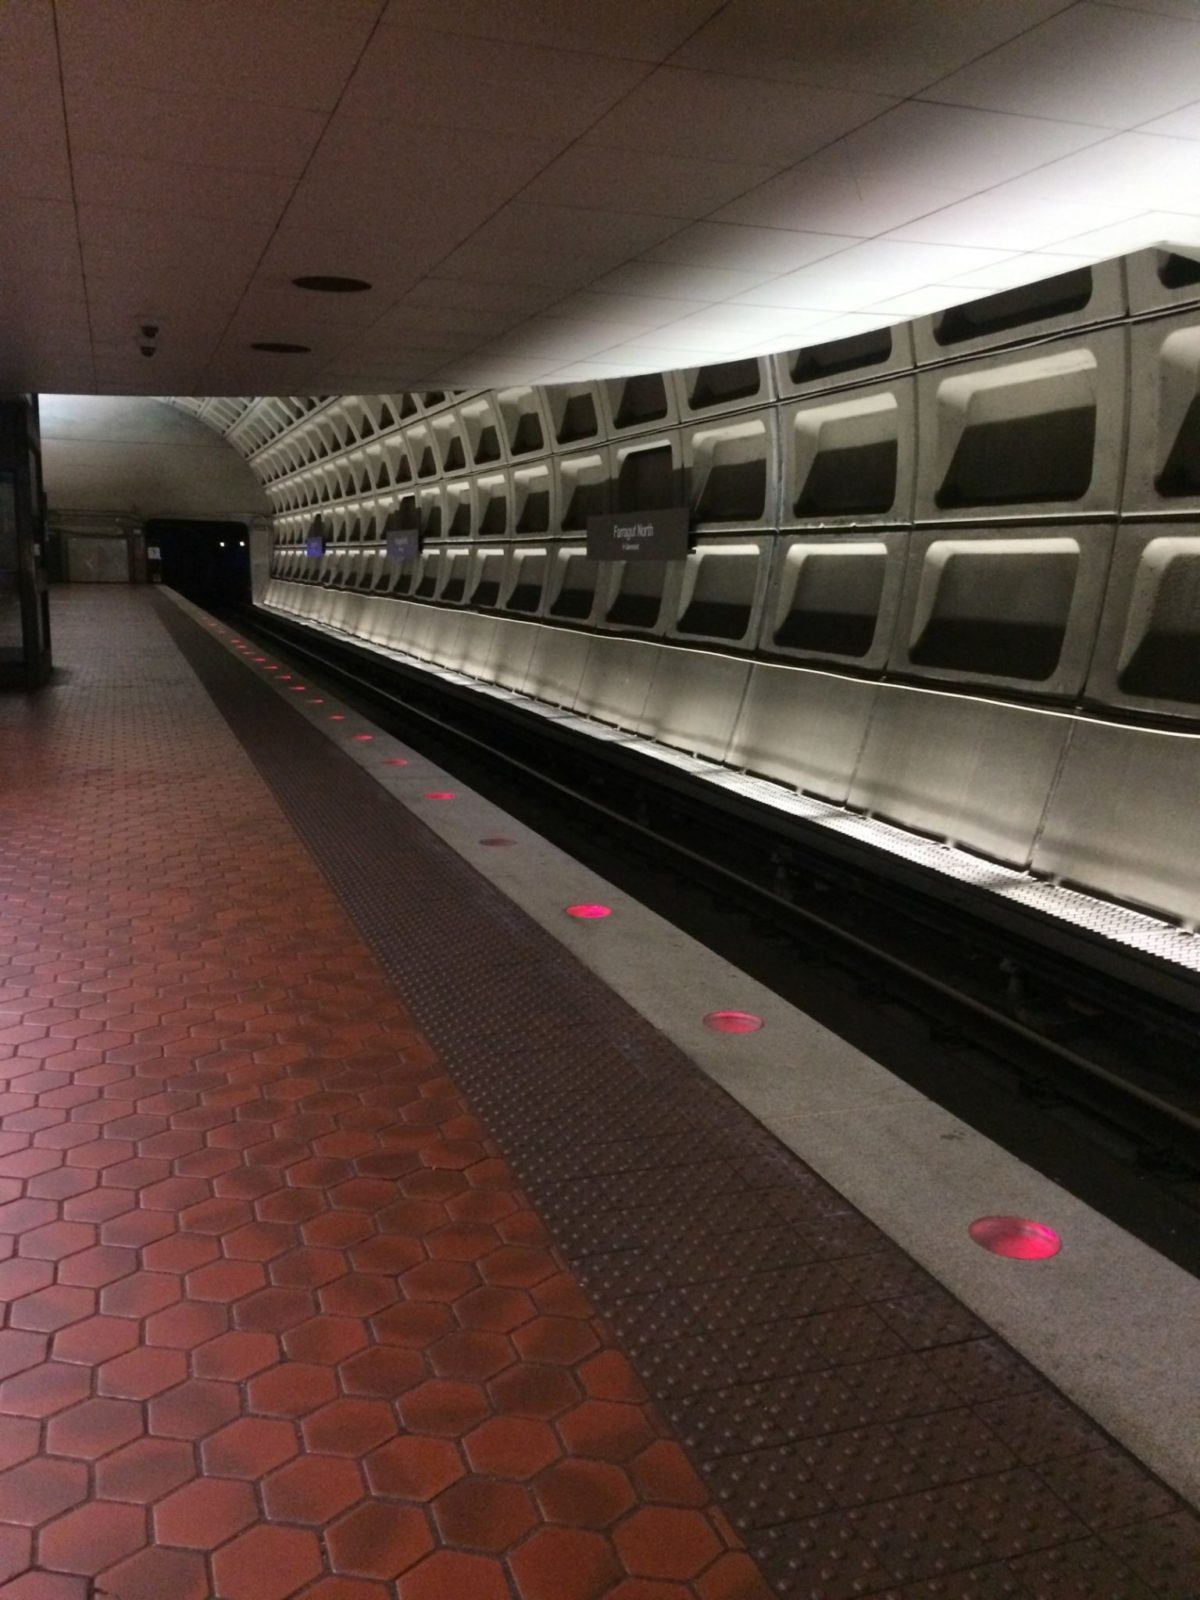 Washington DC public transportation